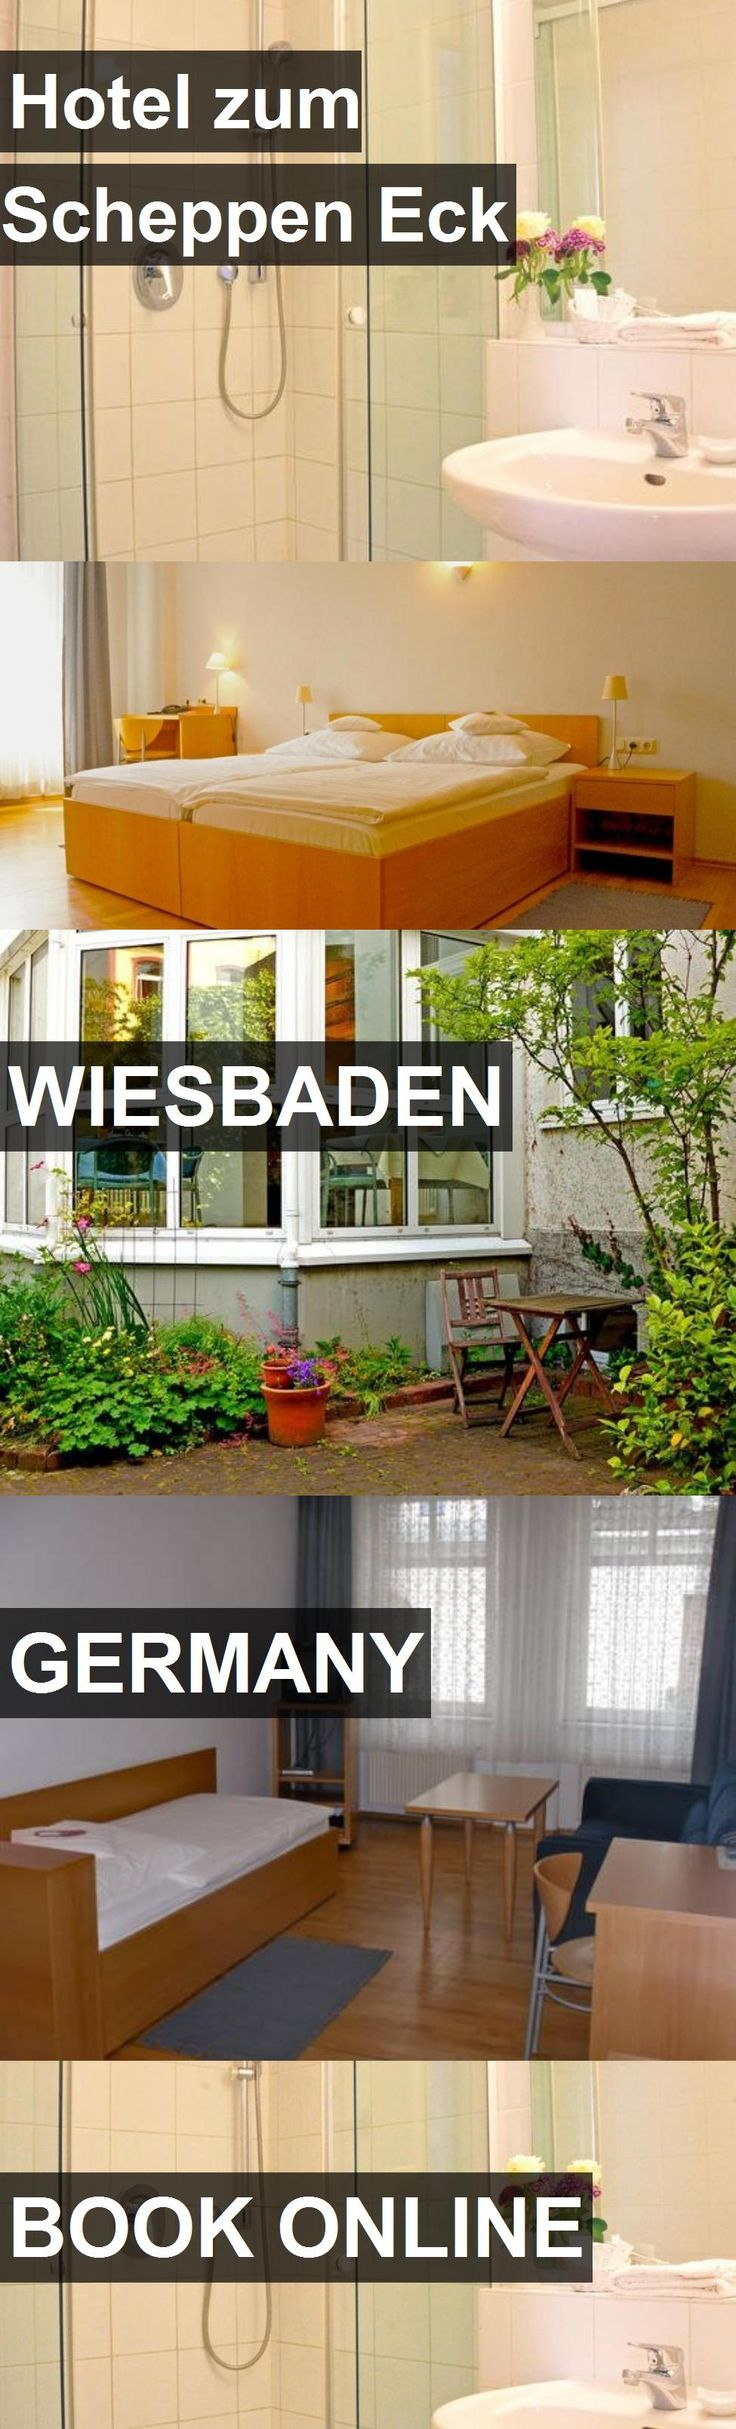 Hotel Hotel zum Scheppen Eck in Wiesbaden, Germany. For more information, photos, reviews and best prices please follow the link. #Germany #Wiesbaden #HotelzumScheppenEck #hotel #travel #vacation